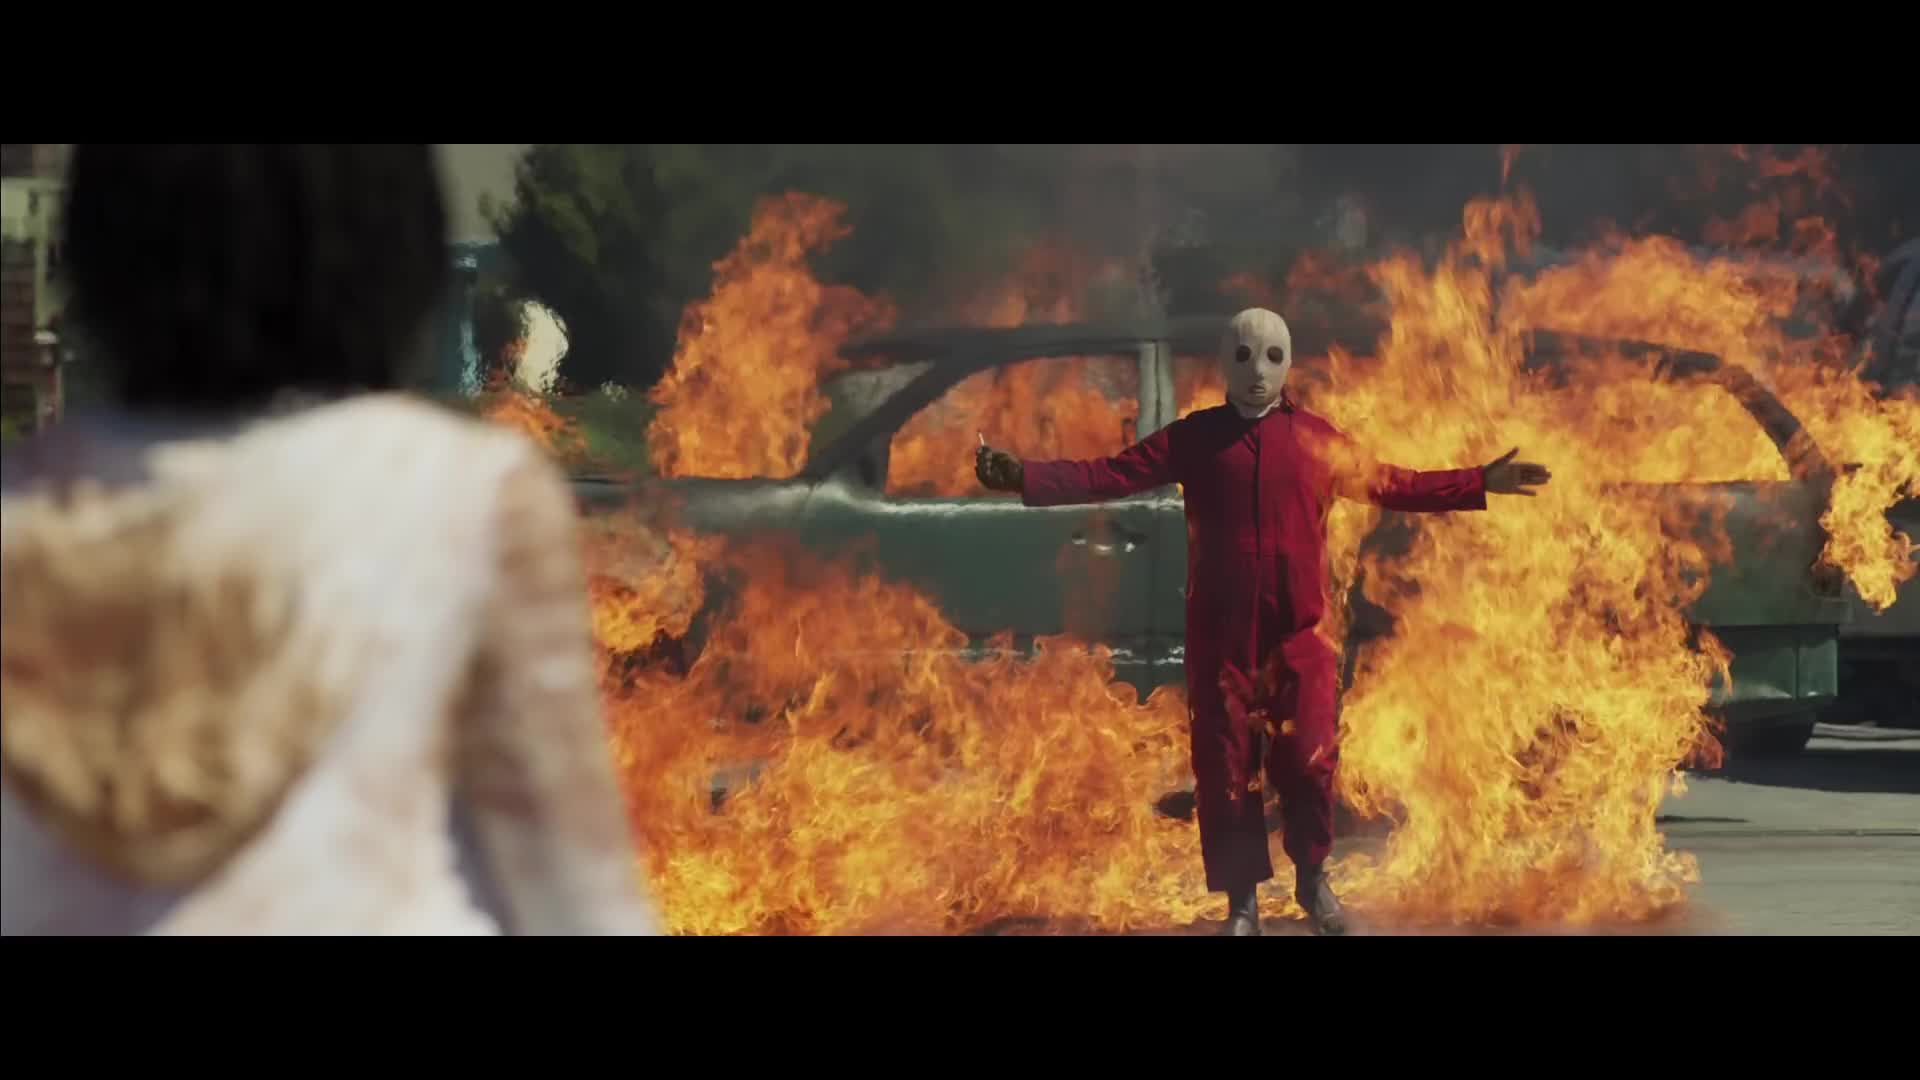 Trailer, Werbespot, Kino, Kinofilm, Super Bowl, Super Bowl 2019, Wir